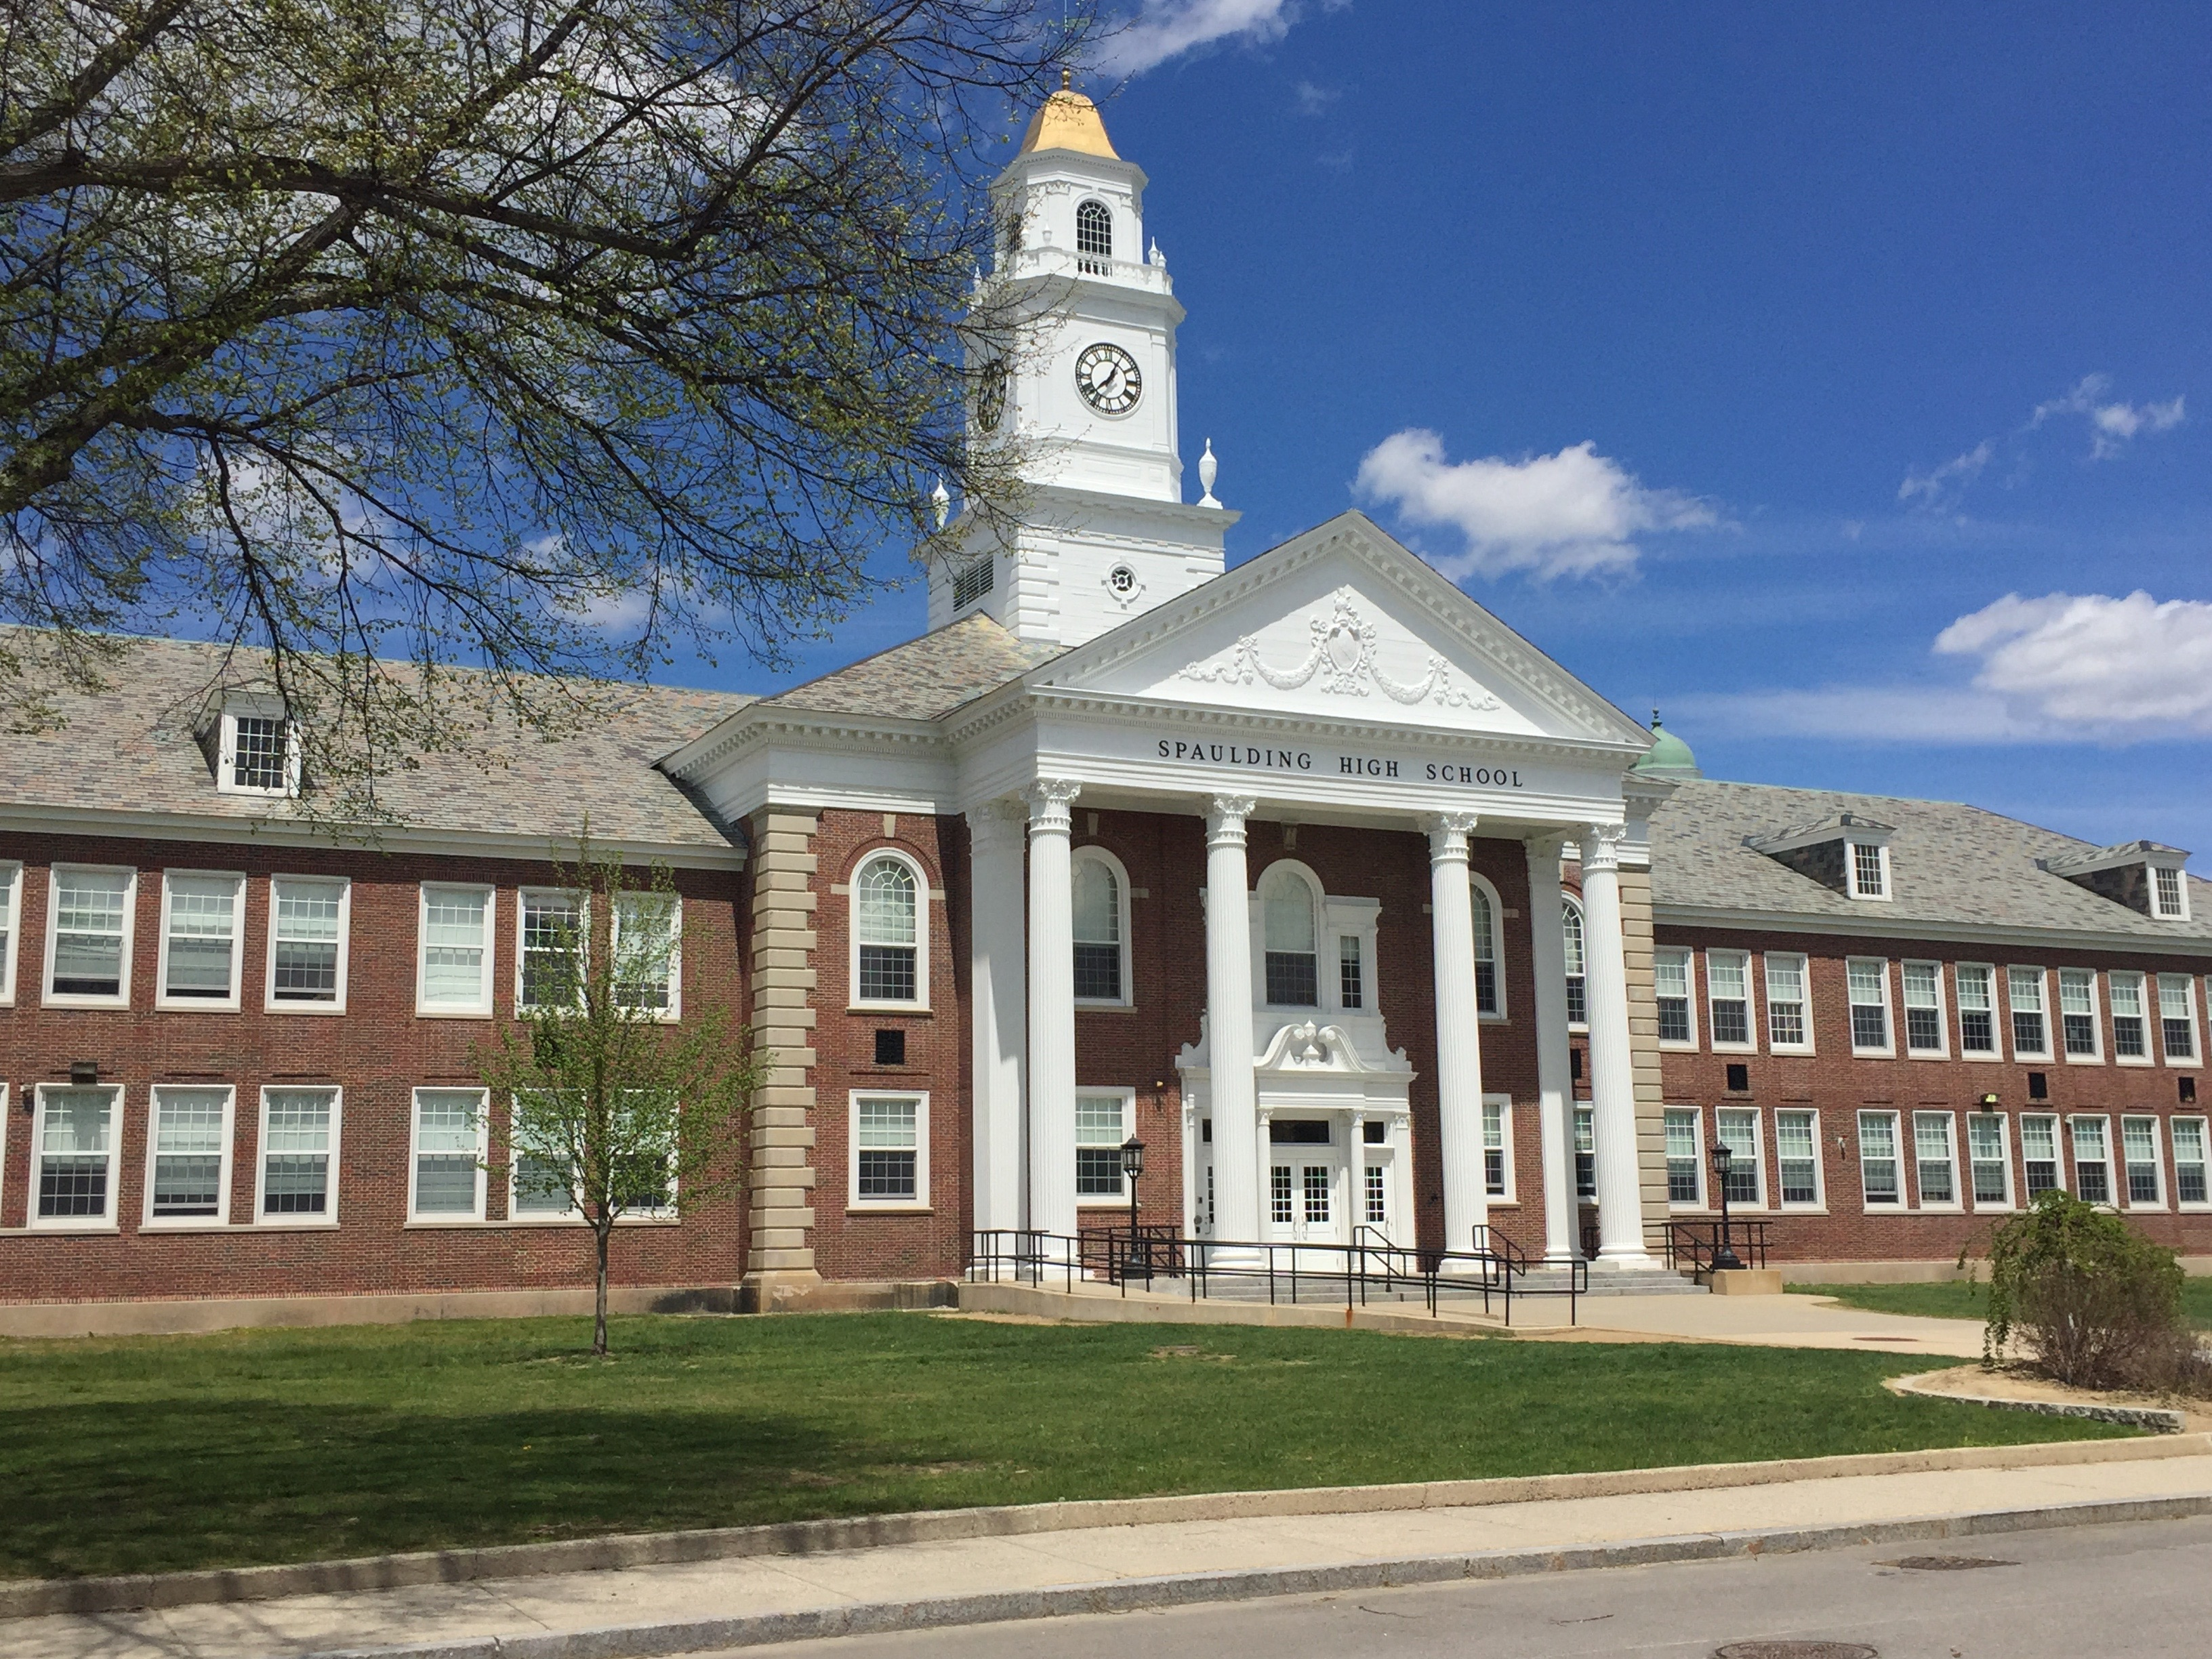 Spaulding High School (New Hampshire) - Wikipedia